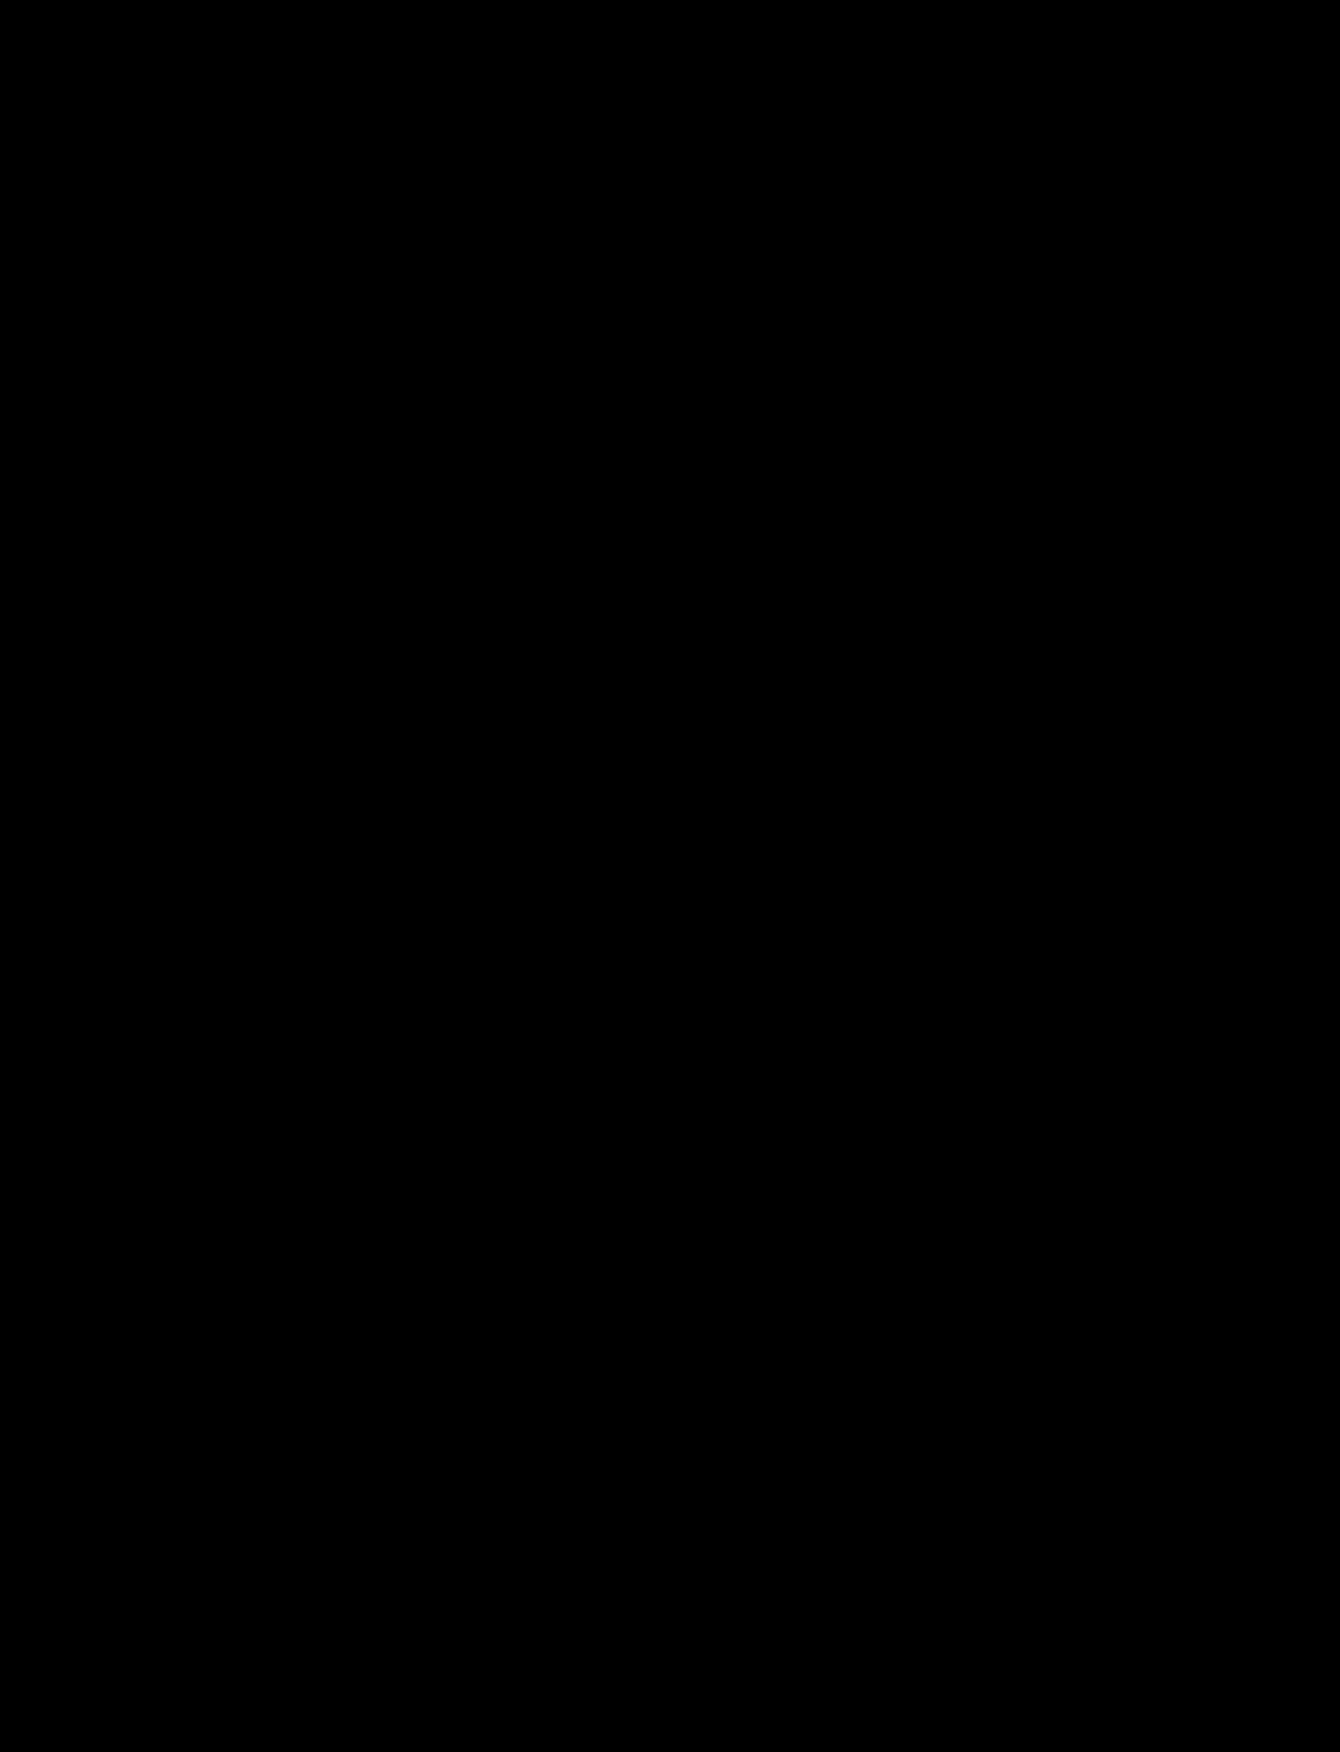 Line Art Ninja : Ultimate ninja impact lineart by naruttebayo on deviantart